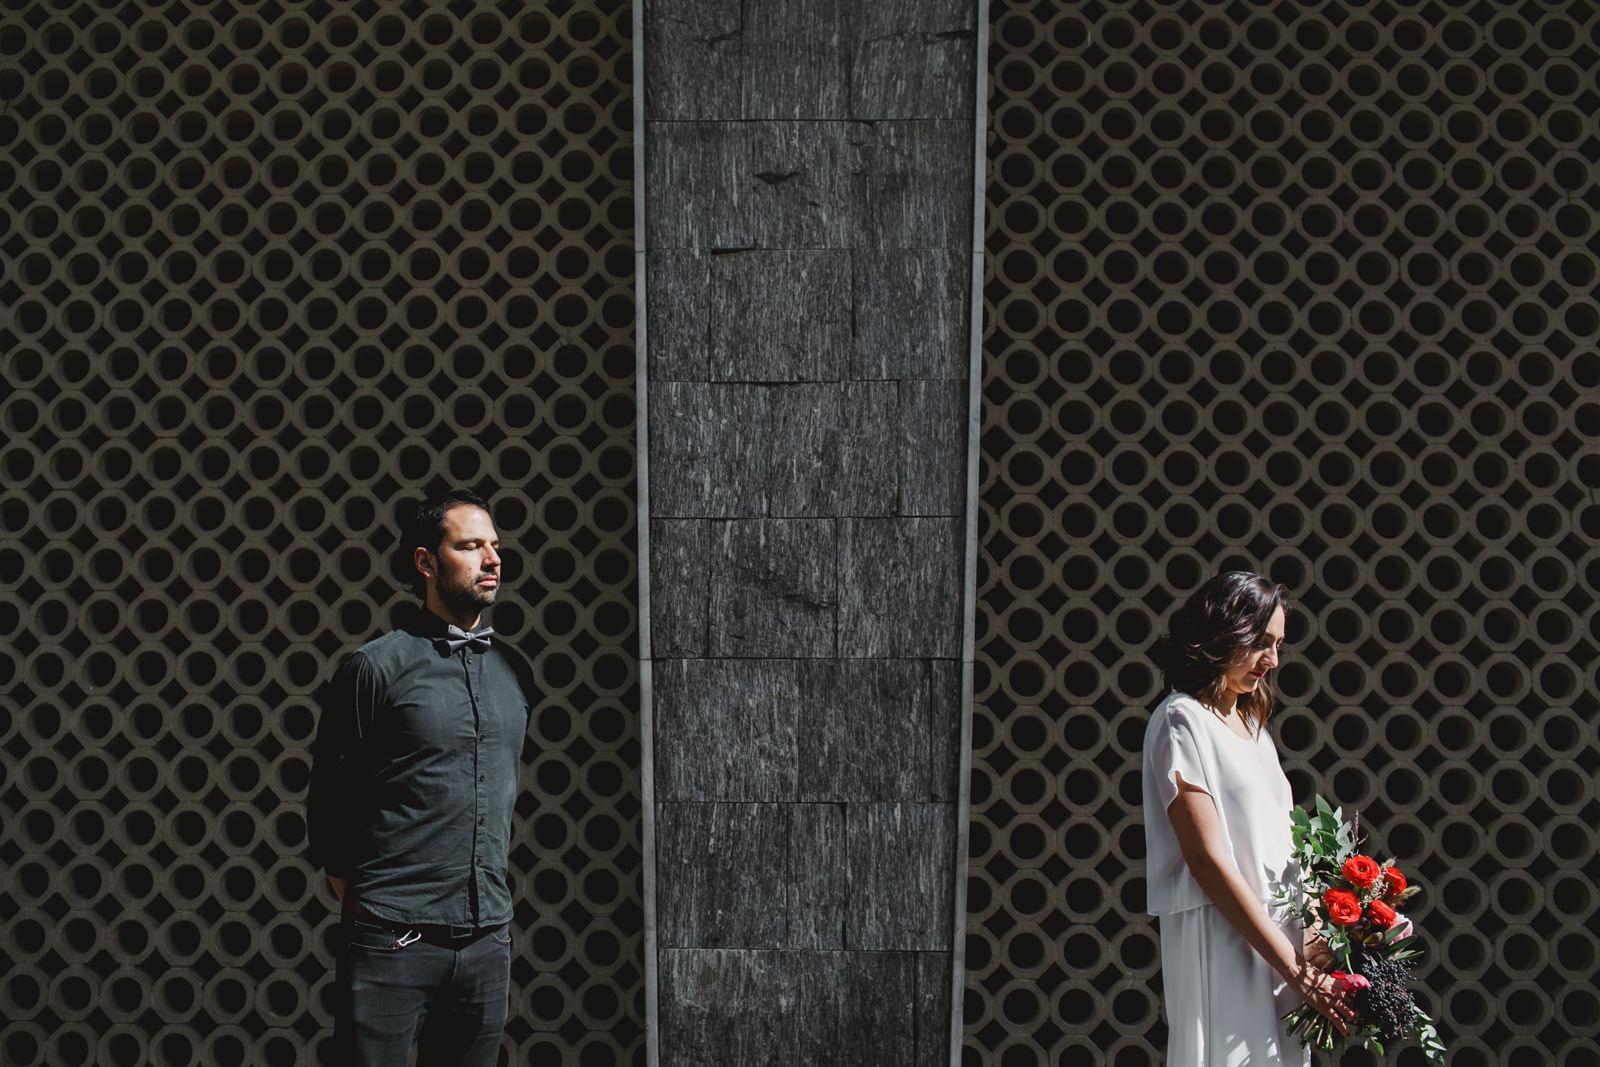 boda-en-cdmx-armando-aragon-027